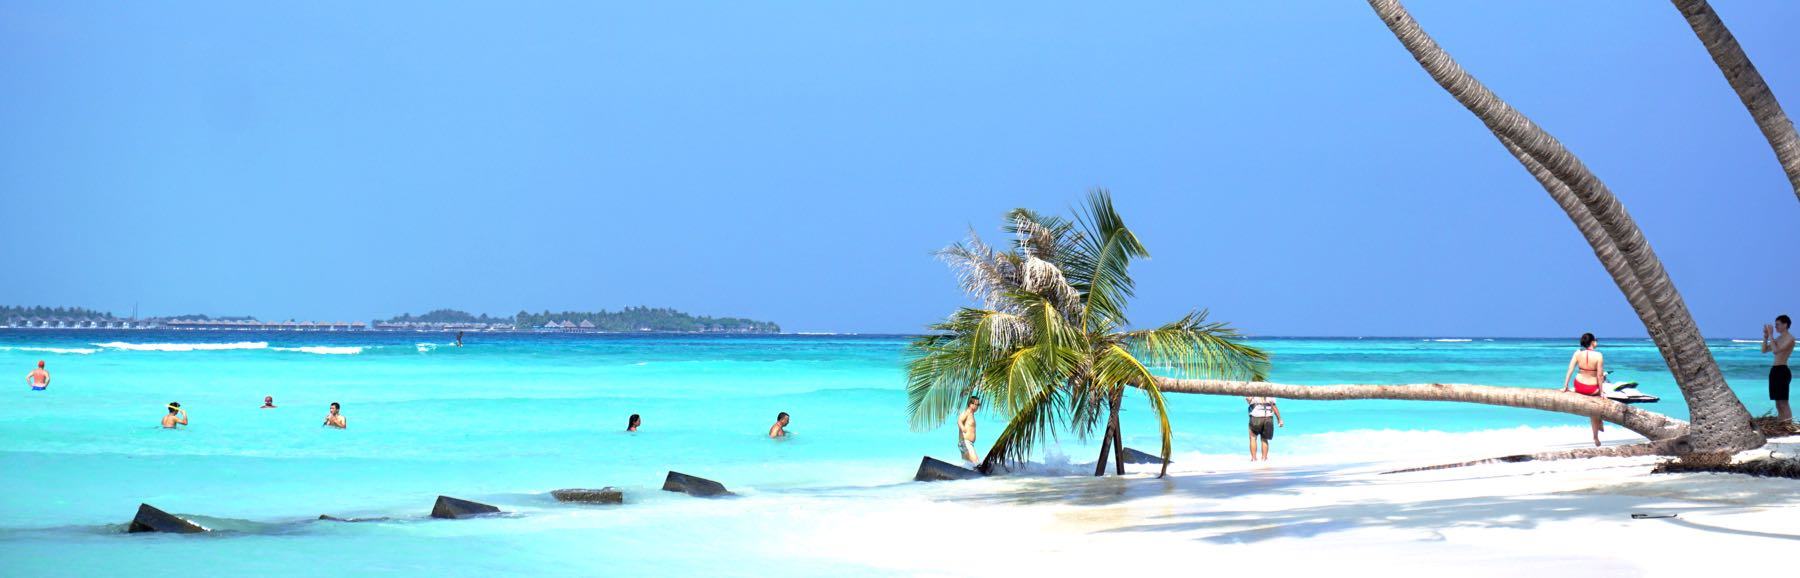 Paket Liburan ke Maldives